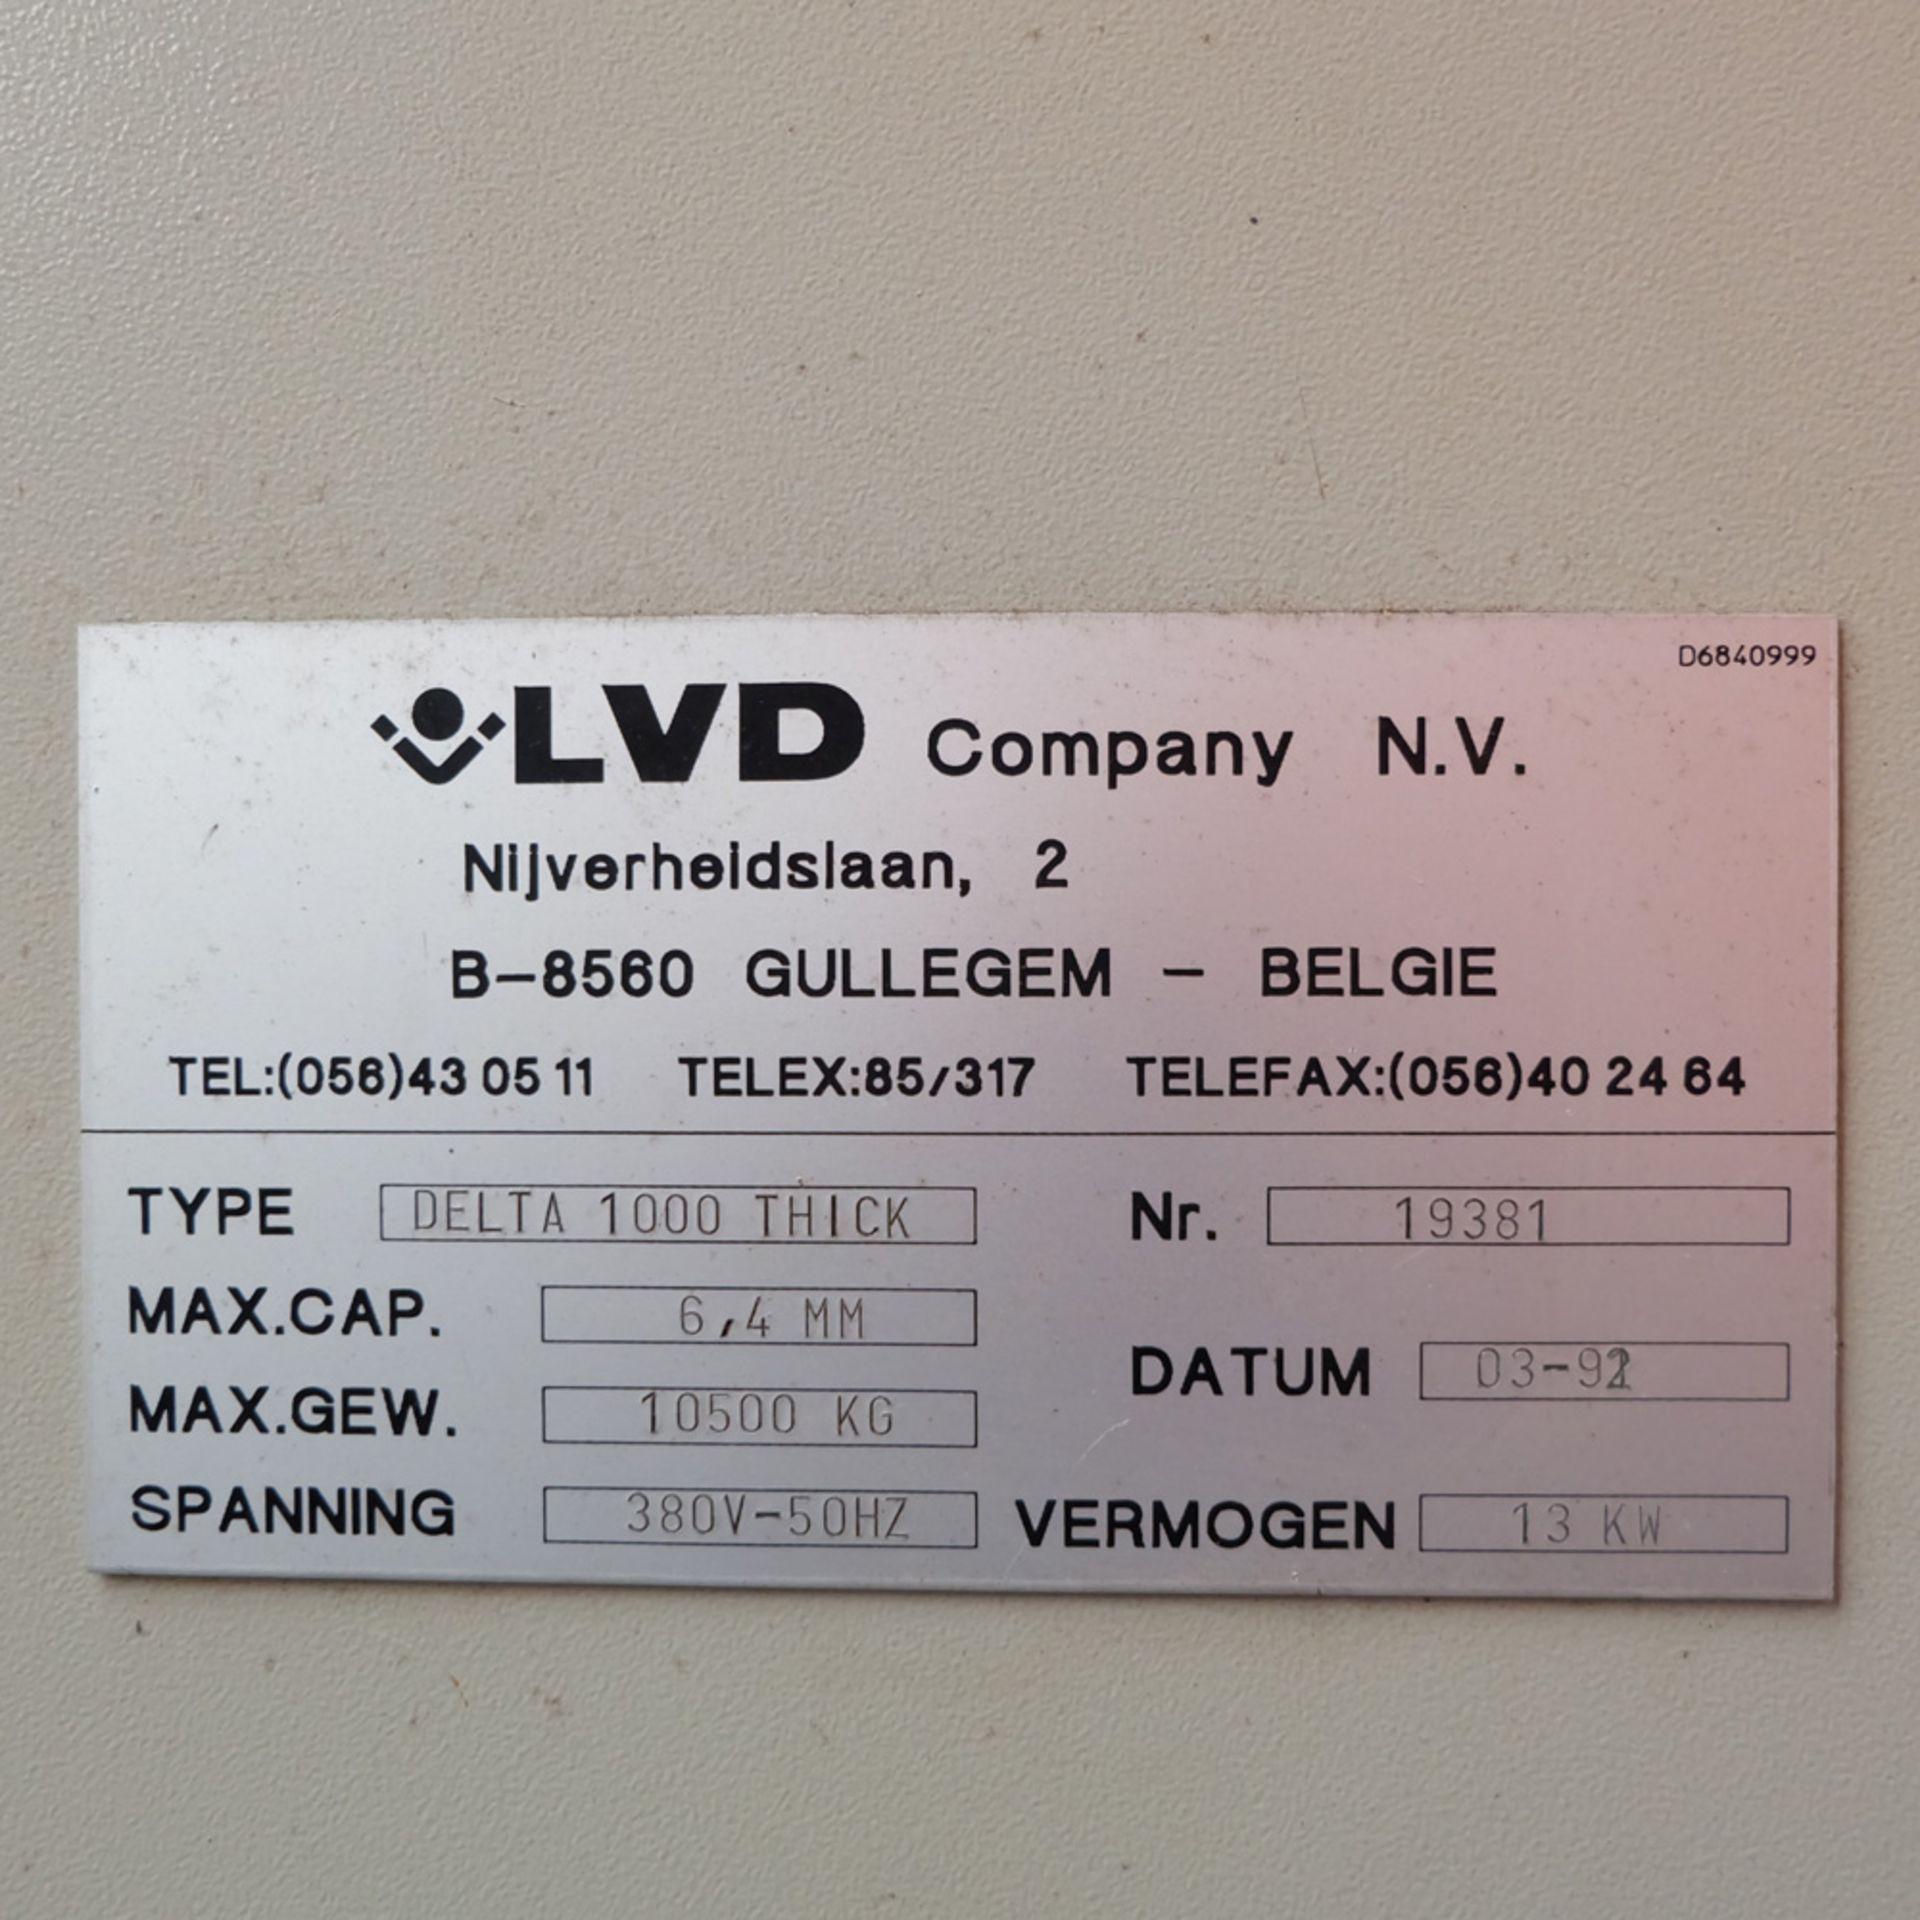 LVD Shape Delta 1000 Thick CNC Turret Punching Machine. - Image 13 of 18